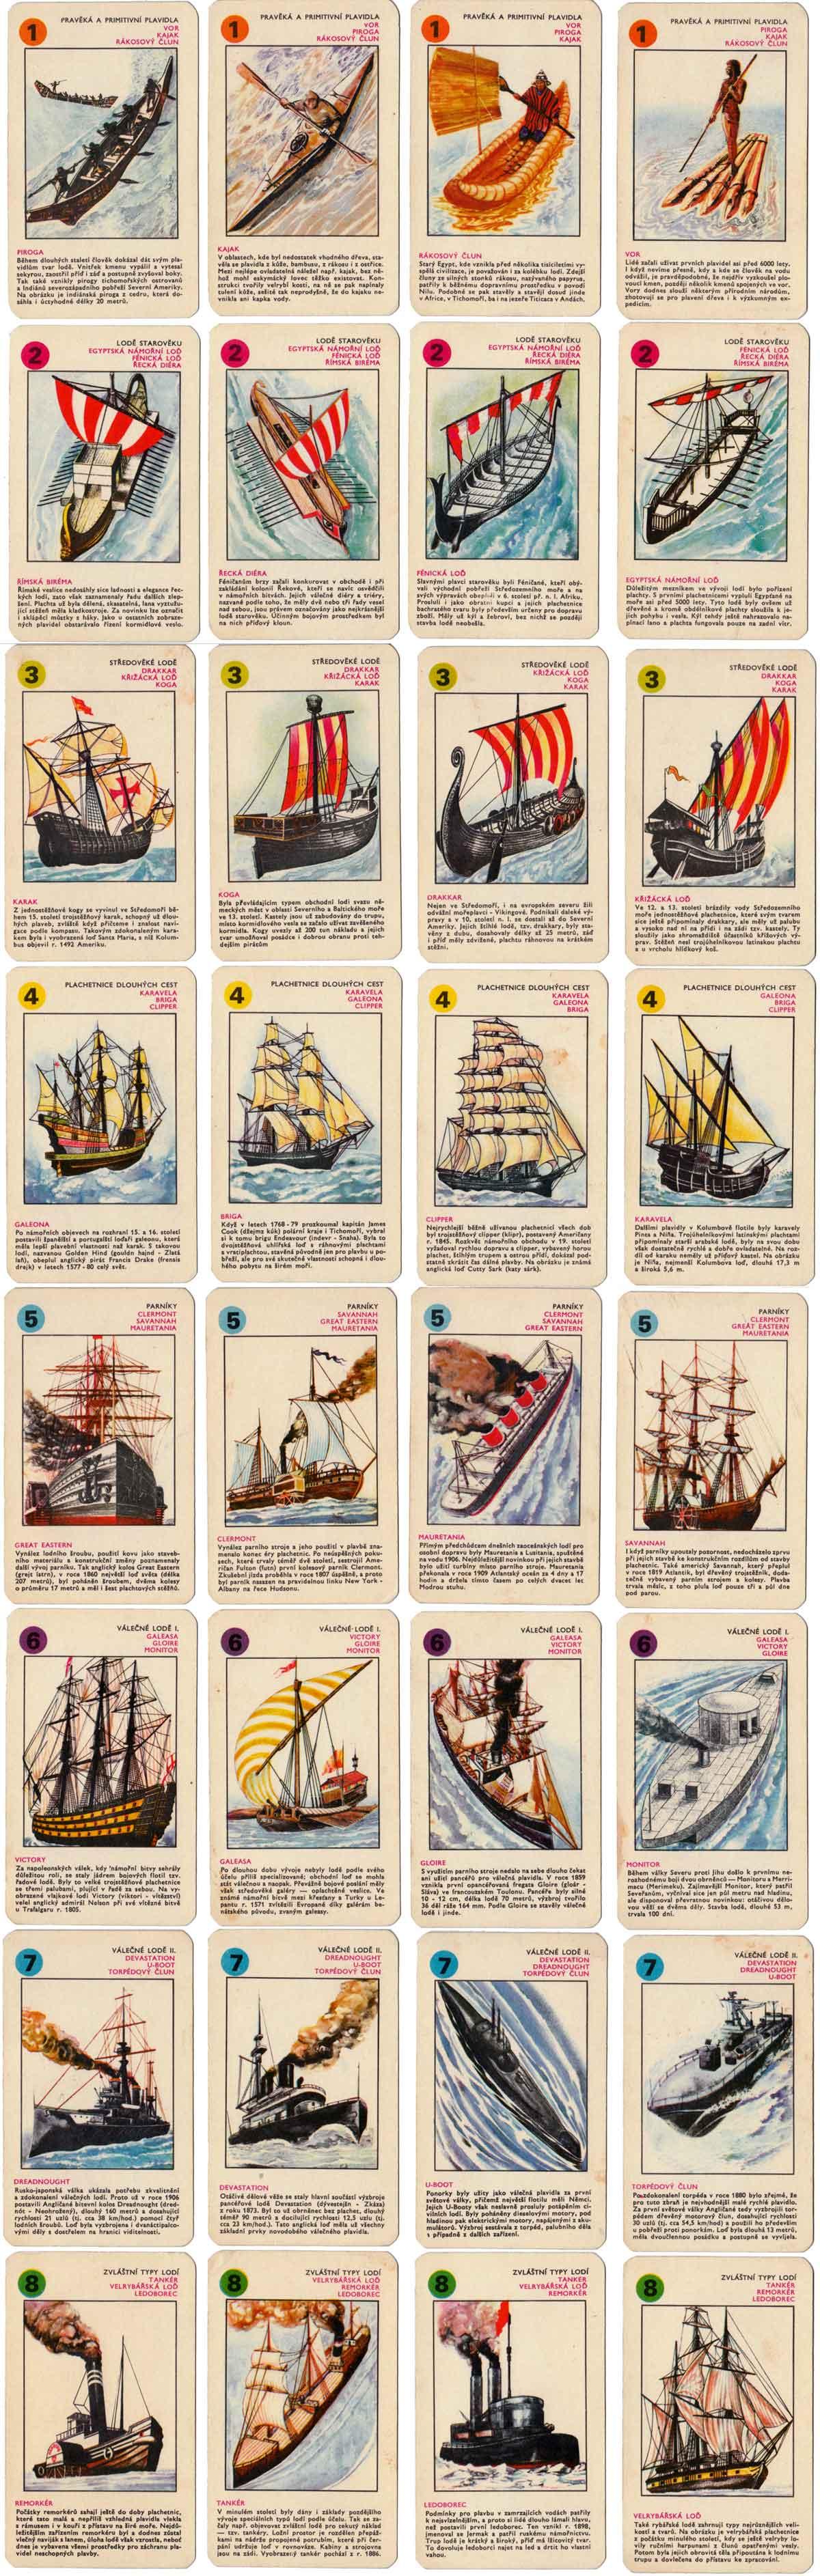 Historic Ships quartet game from Czechoslovakia illustrated by Jaromír Vraštil